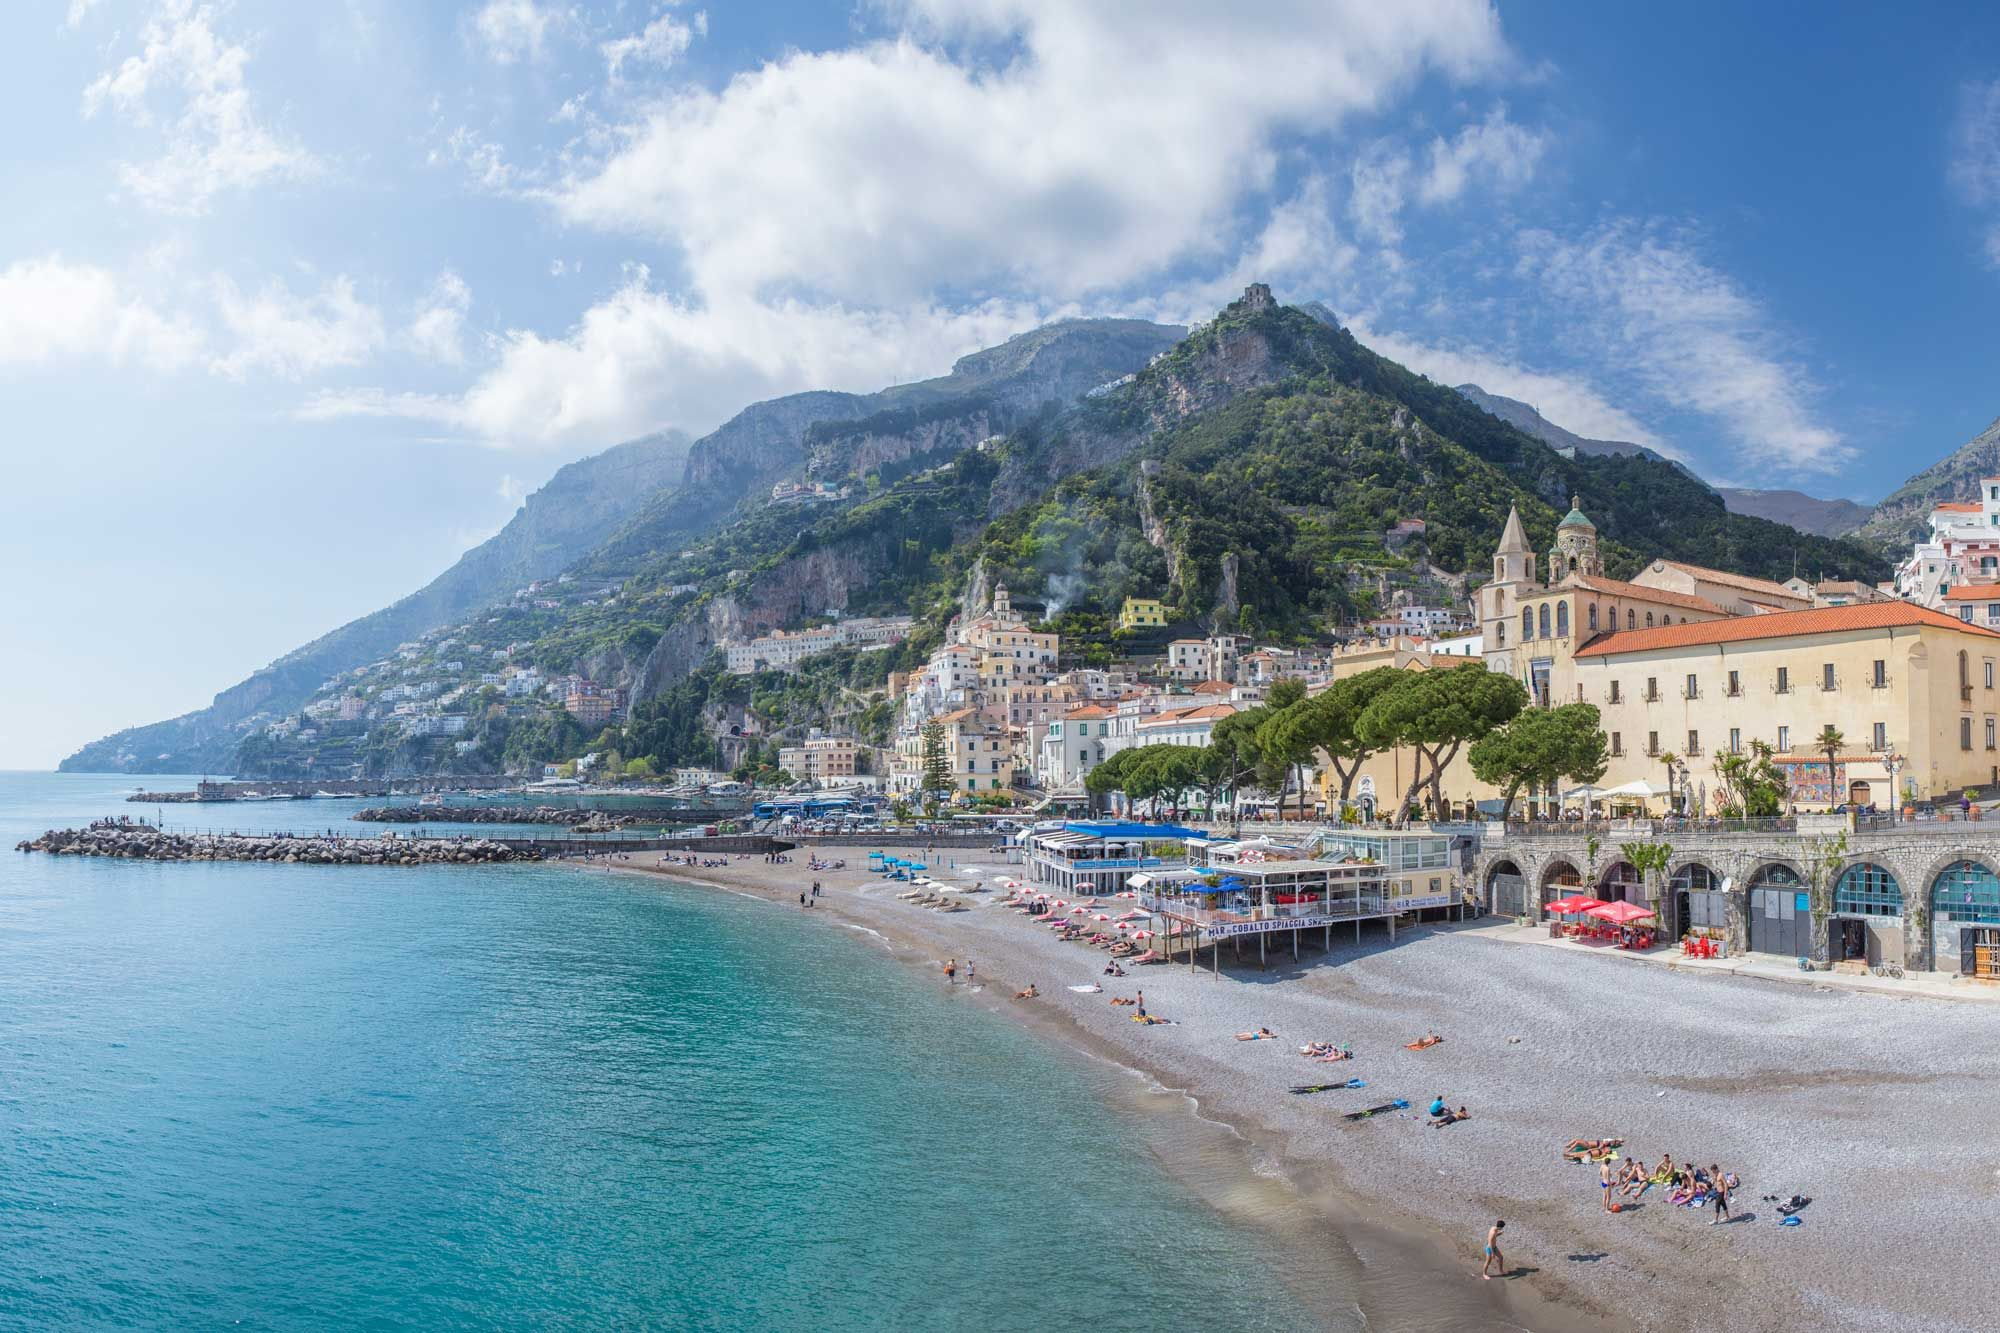 8751e5a5f2d9bae8abb844b73d92a9bd - How Do You Get From Rome To Amalfi Coast